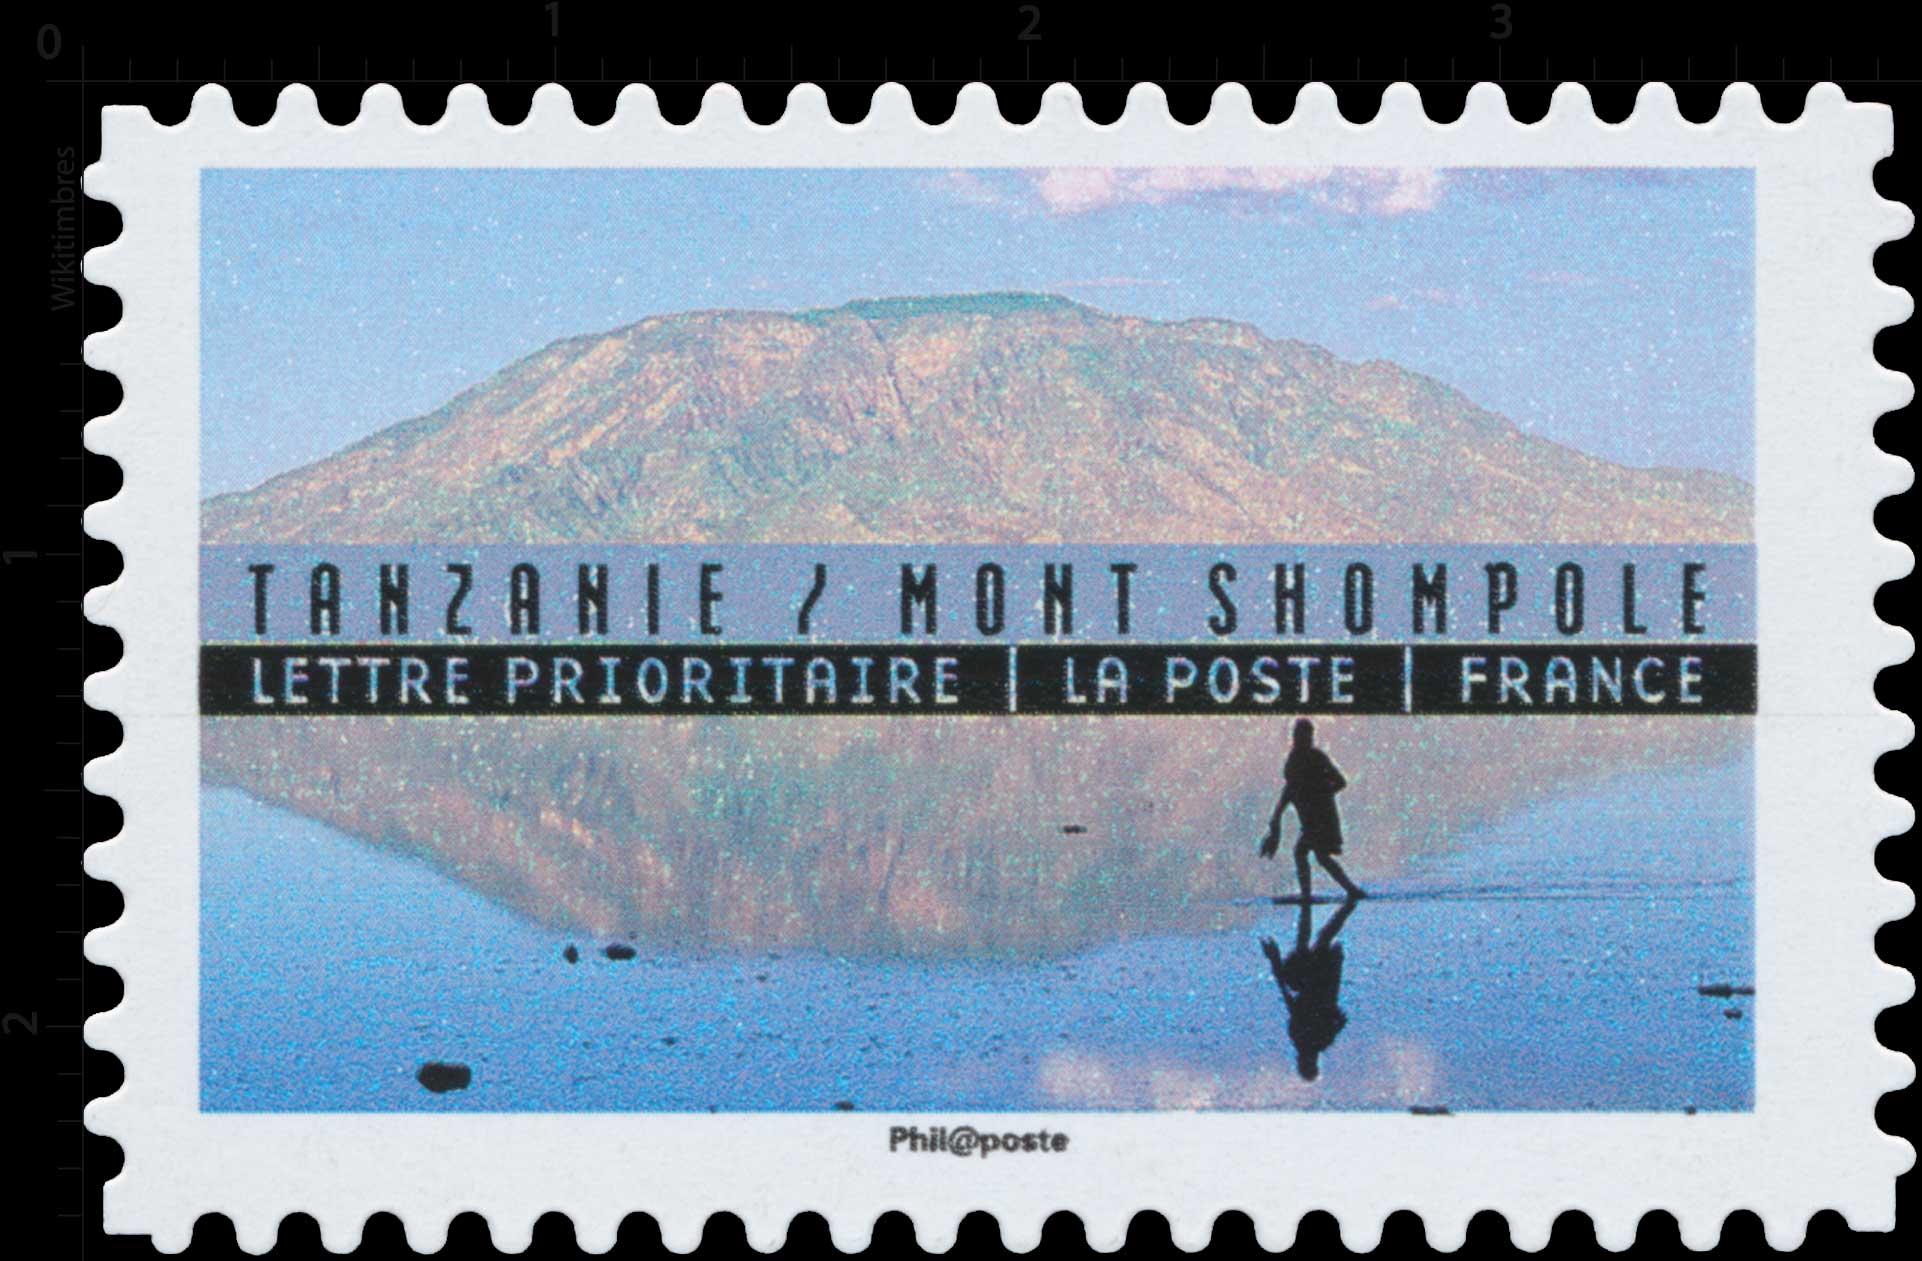 2017 Tanzanie / Mont Shompole